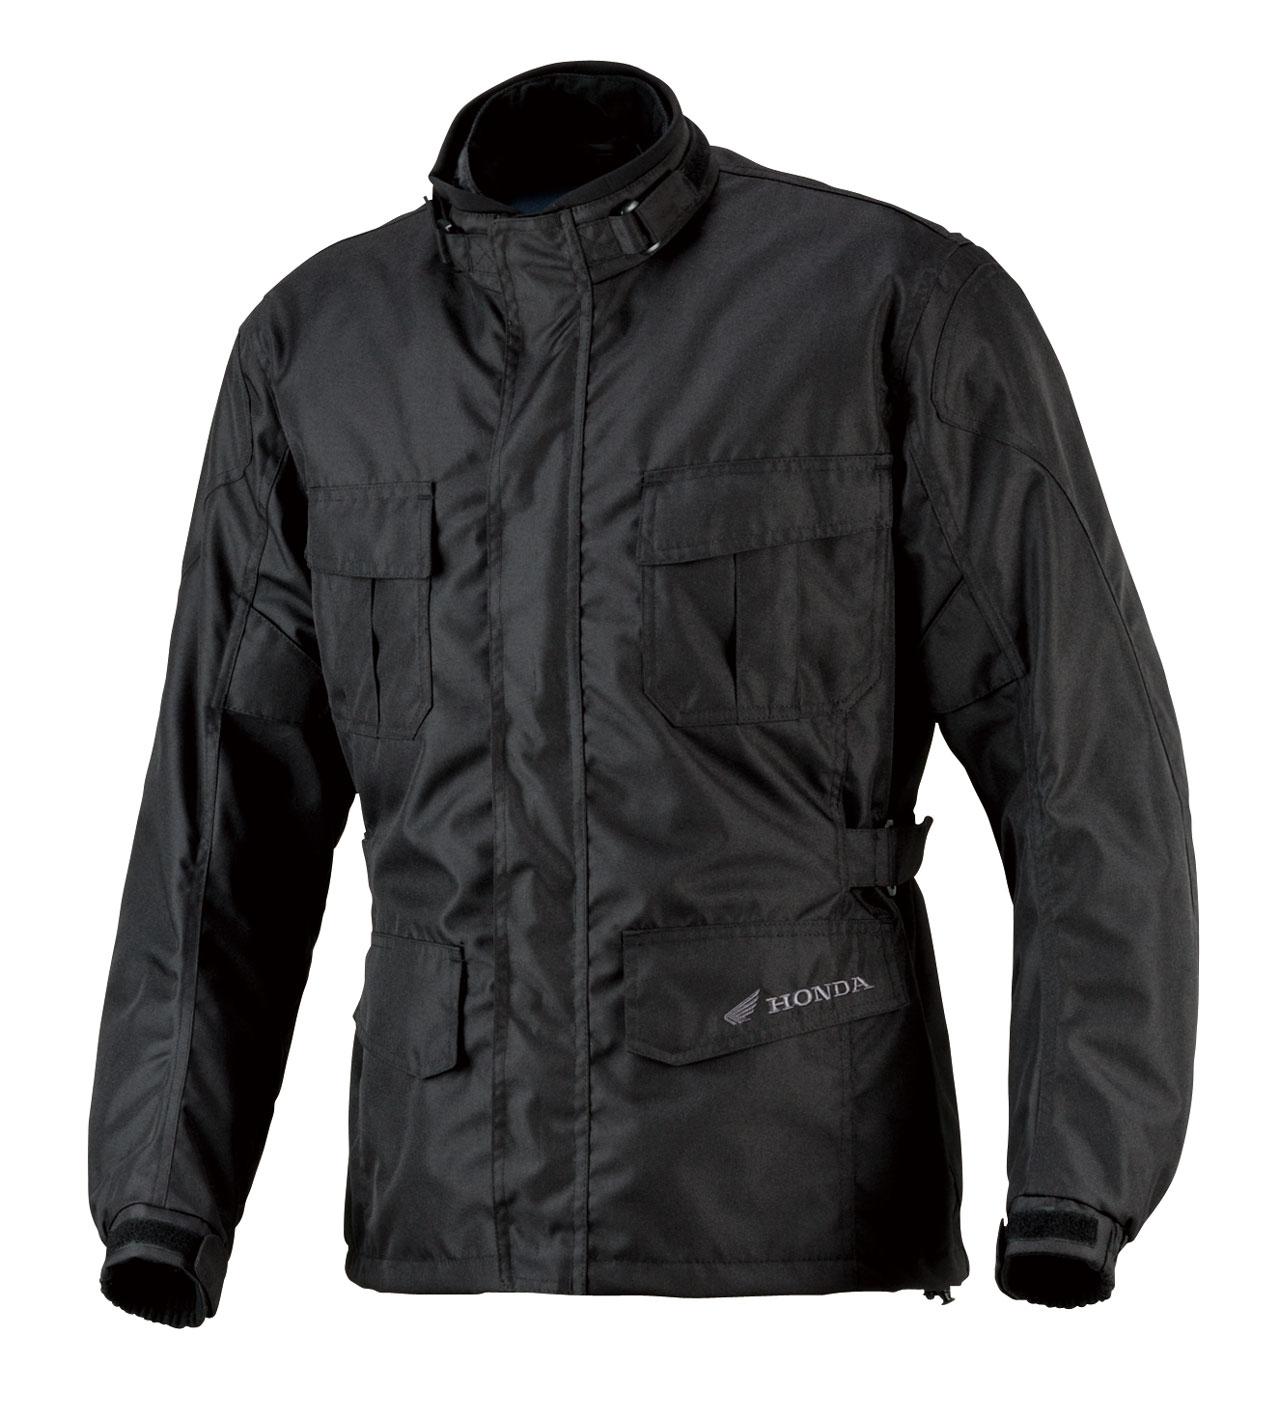 【HONDA RIDING GEAR】Grand冬季套裝 - 「Webike-摩托百貨」